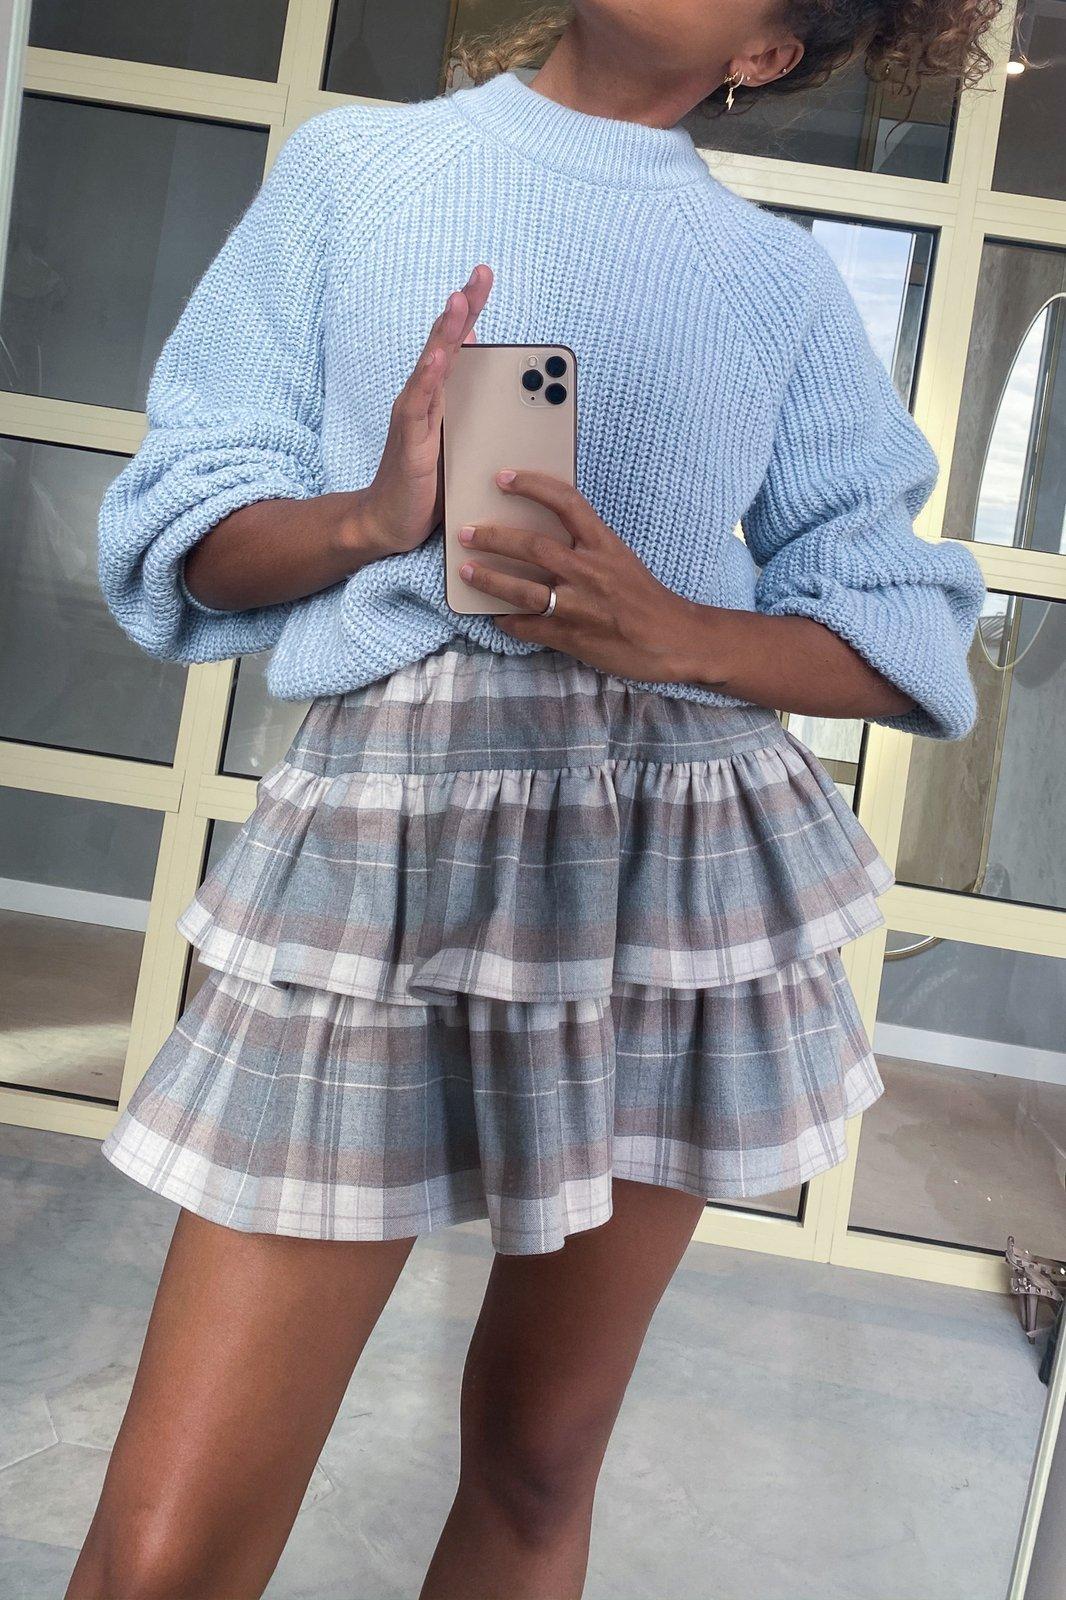 CHEAP Naya Gray Skirt 28617023995 – Women's Dresses & Skirts